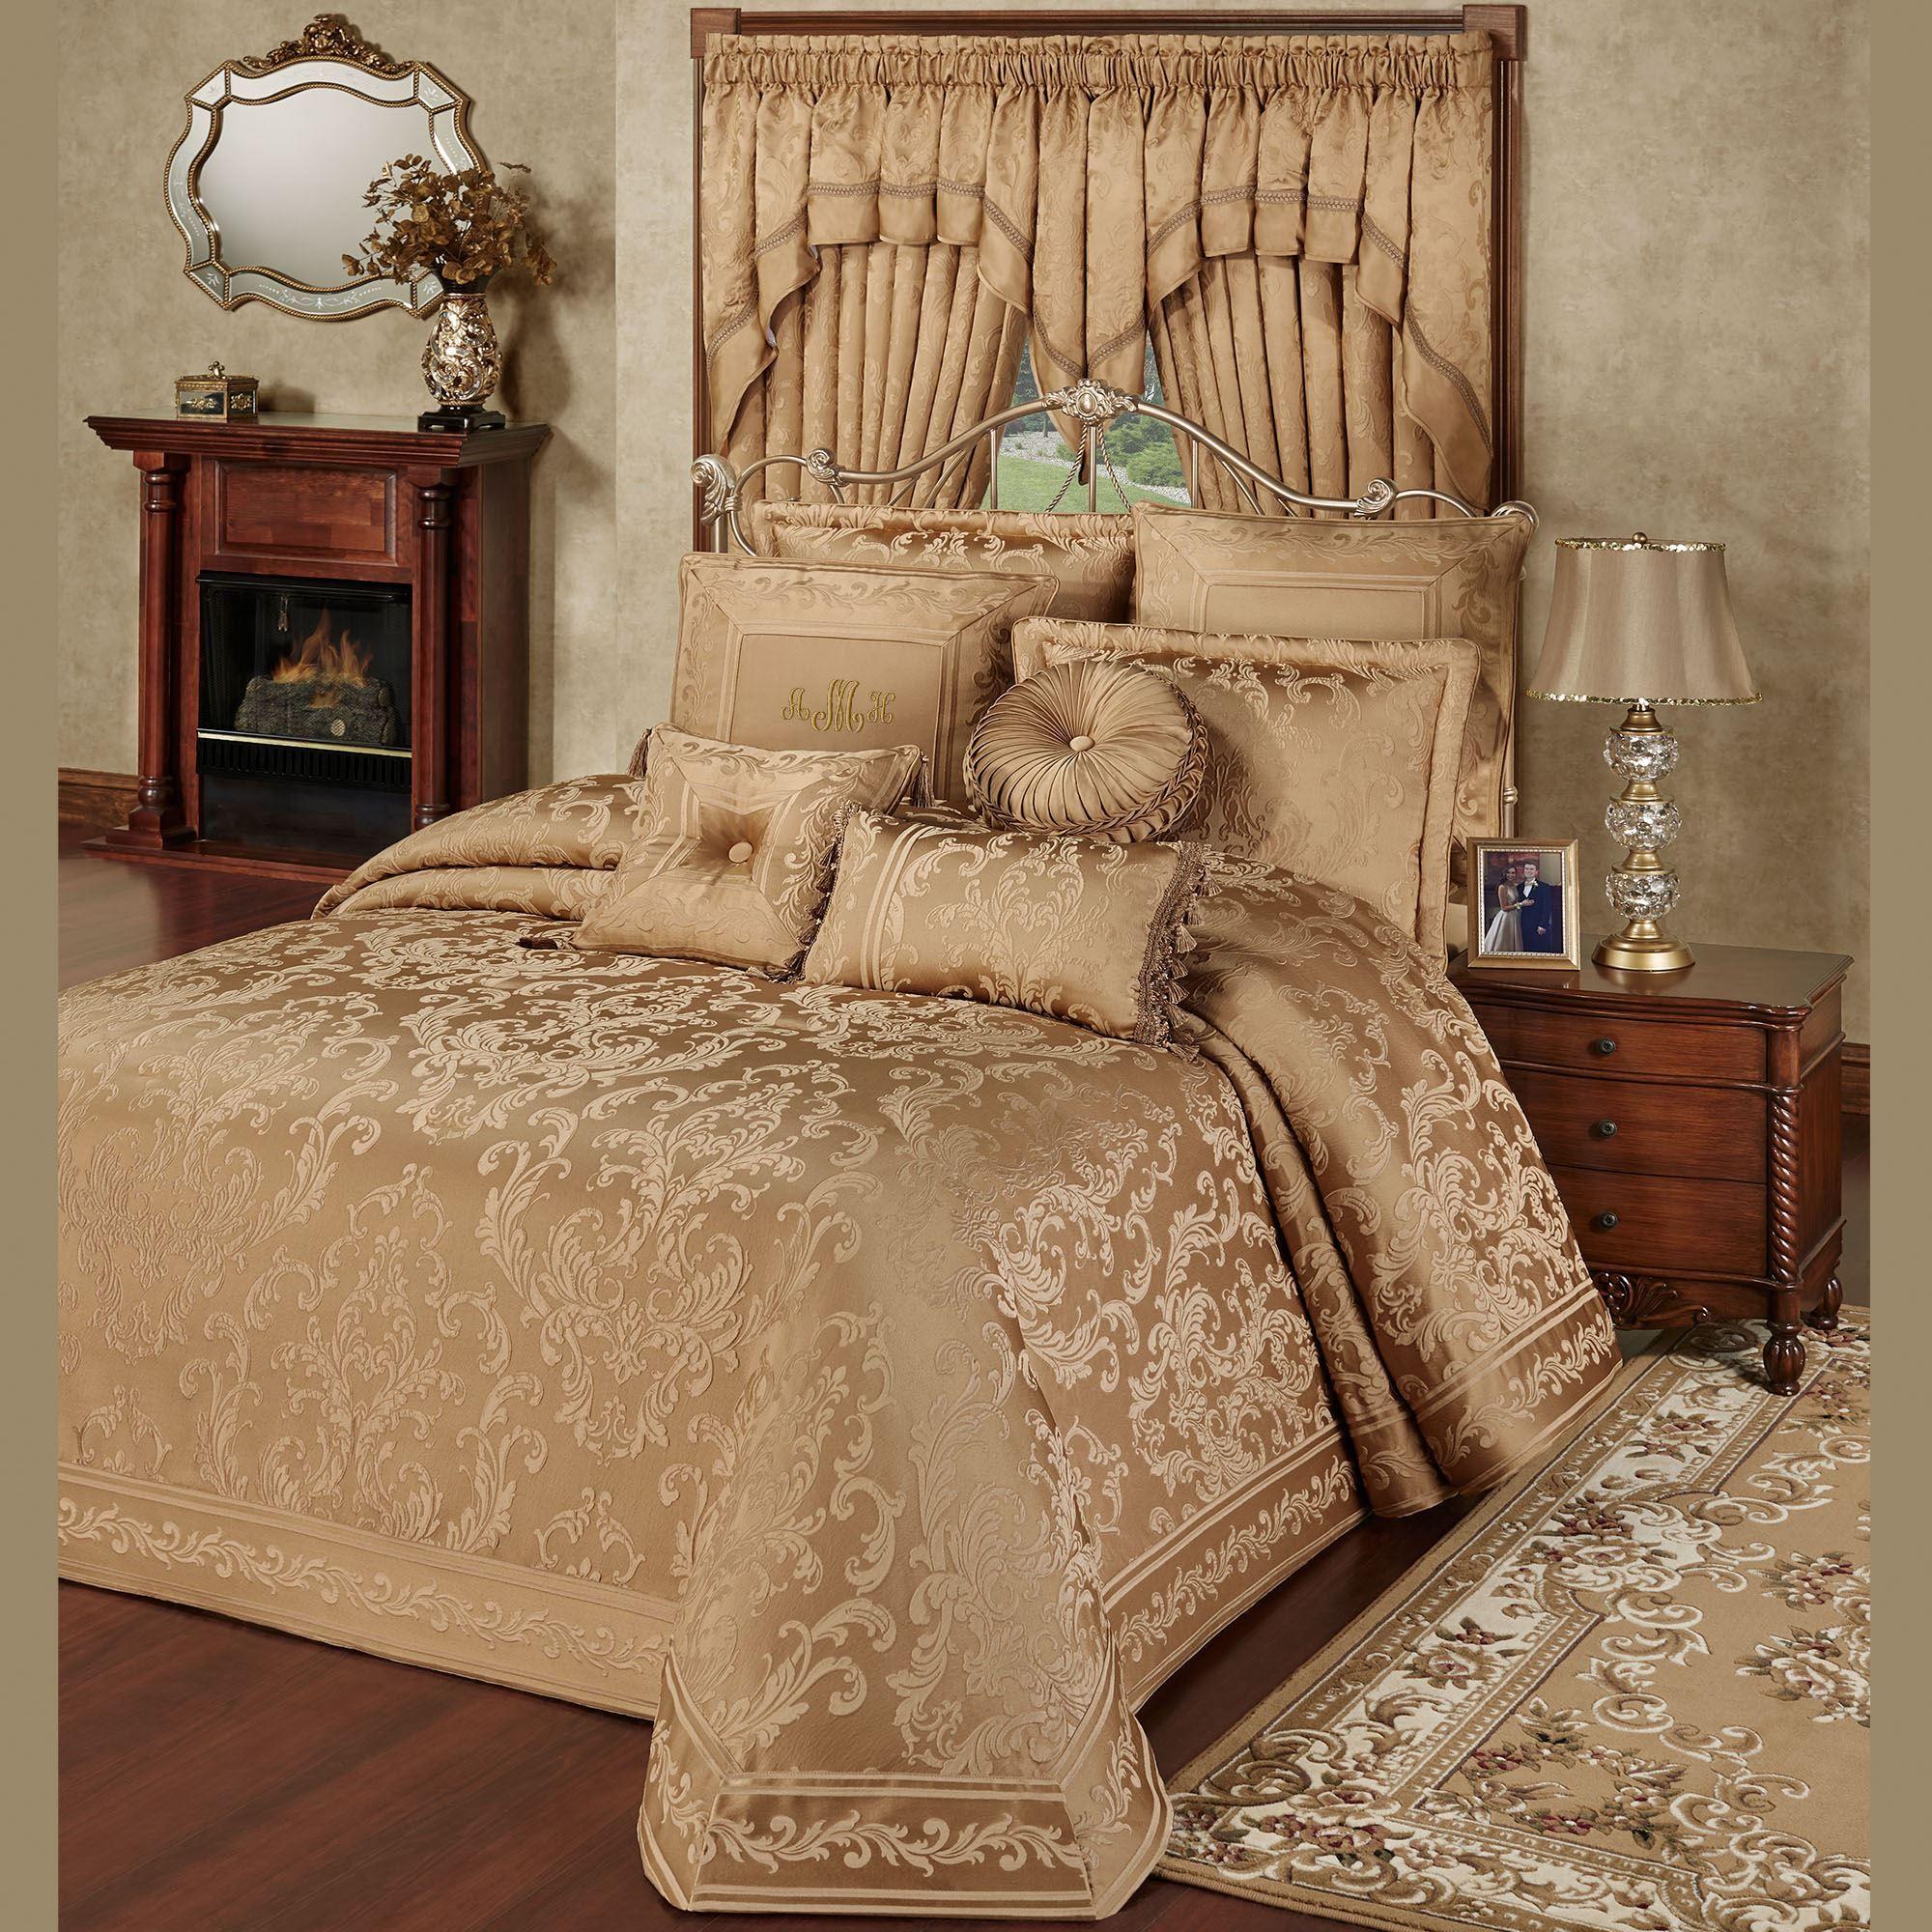 Monaco Gold Damask Oversized Bedspread Bedding